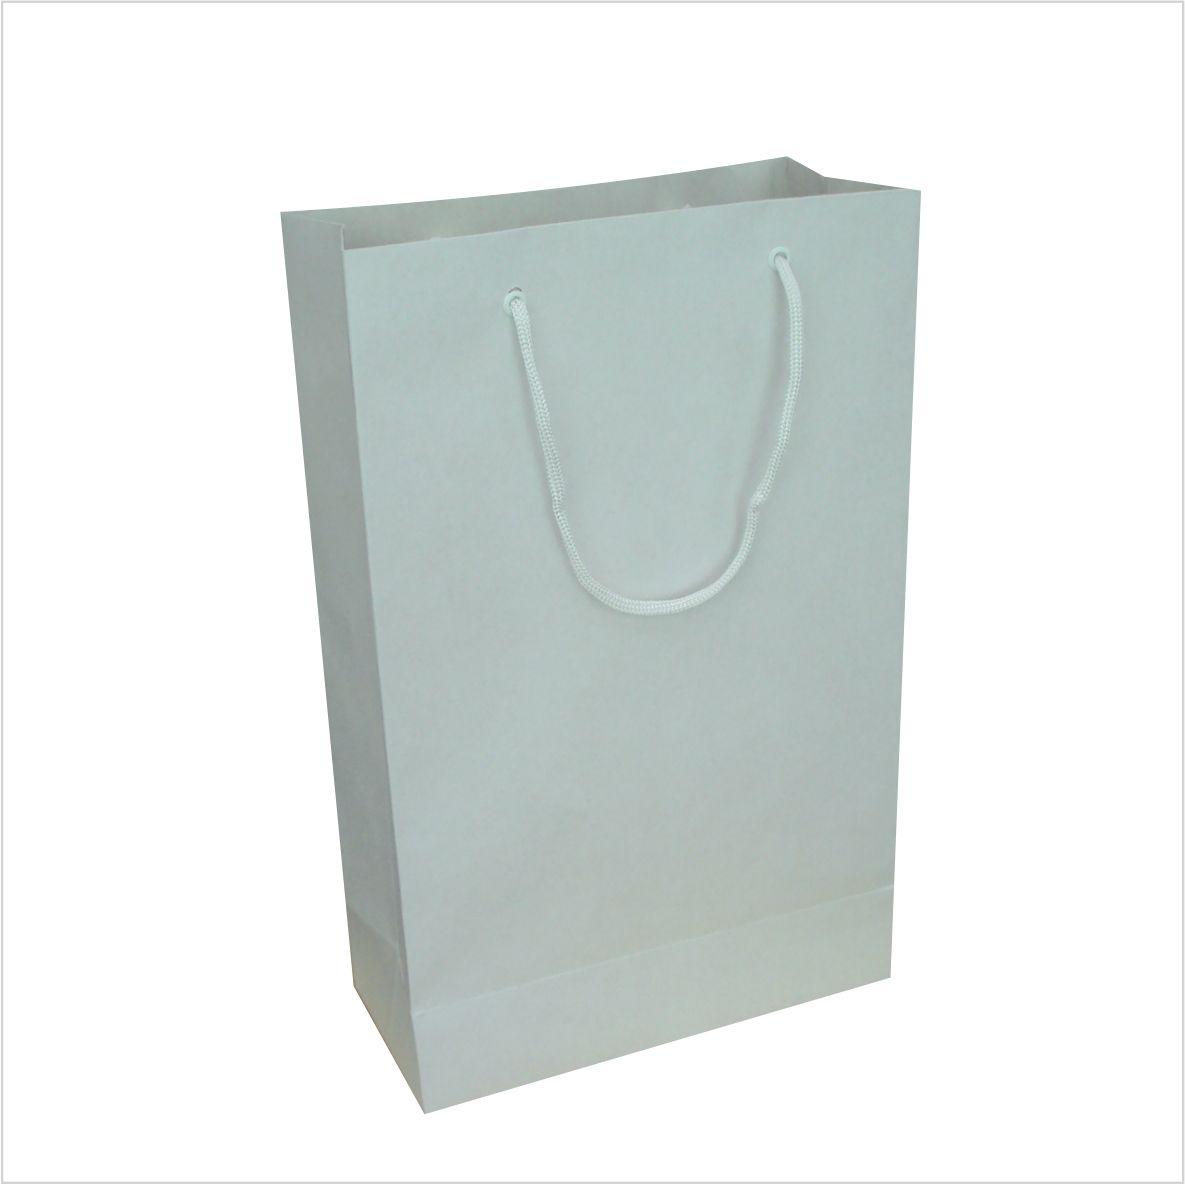 Sacola kraft cor branca média (22x35x10 cm)